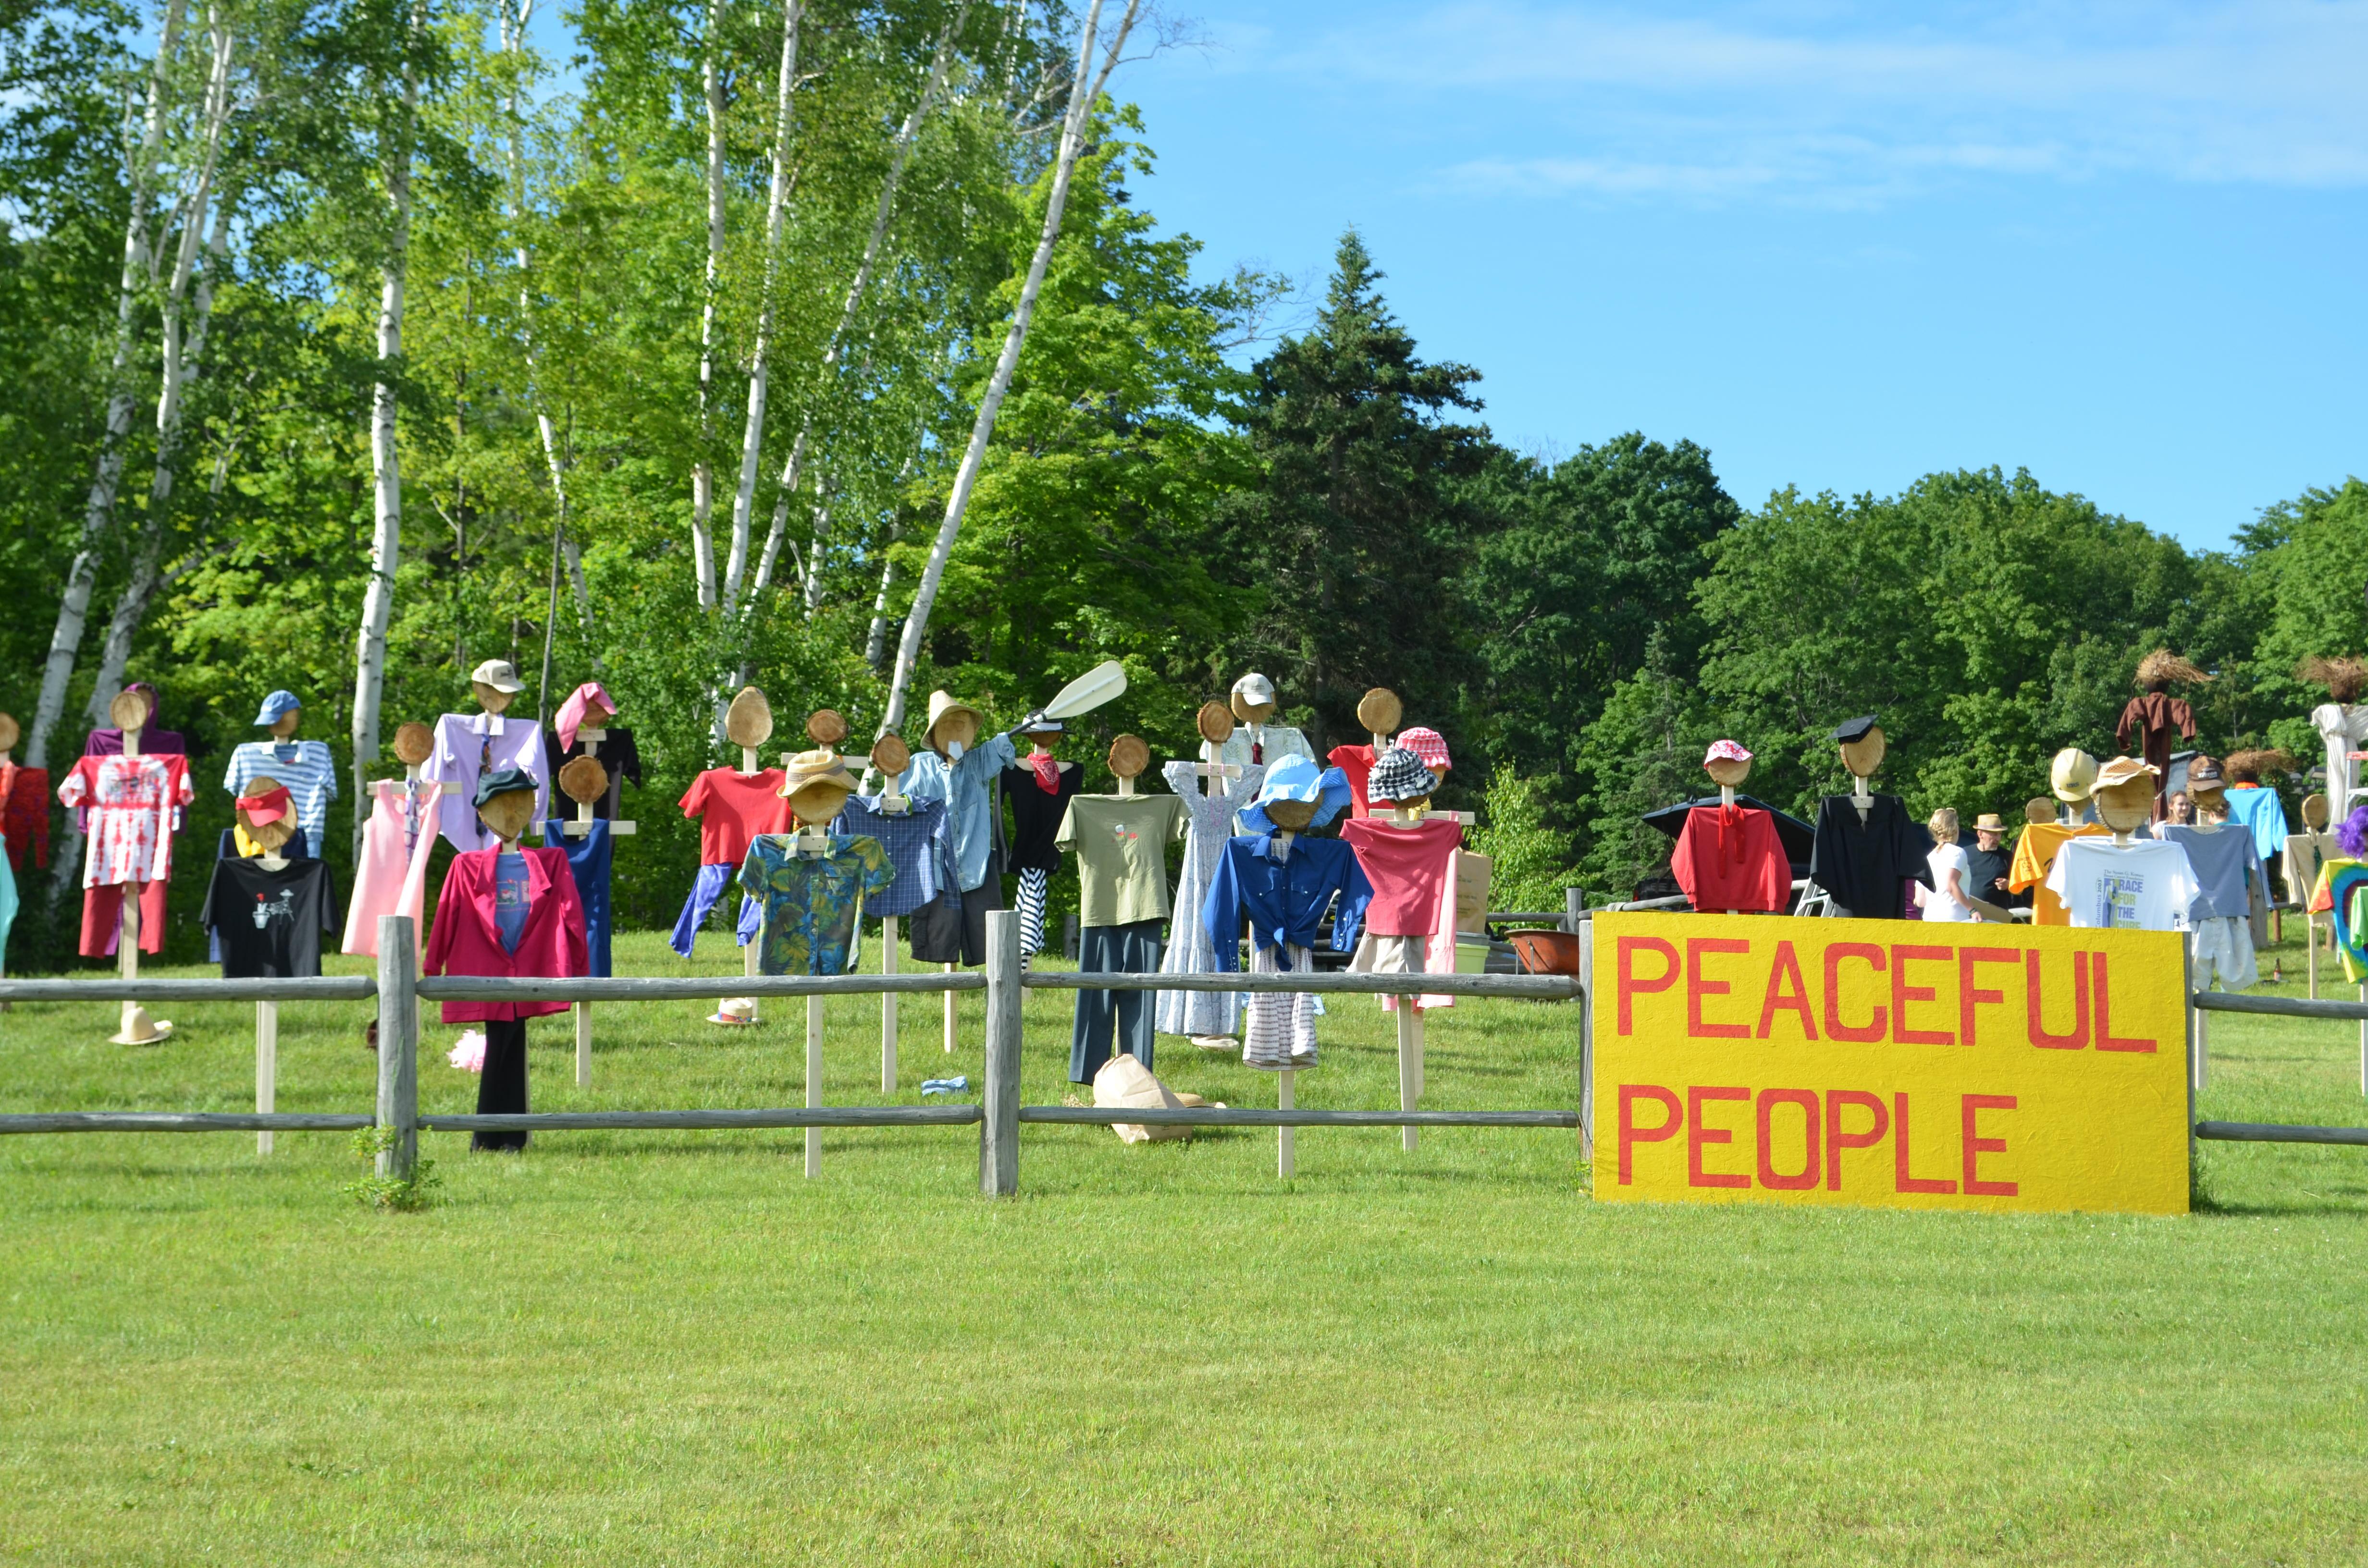 Peaceful People